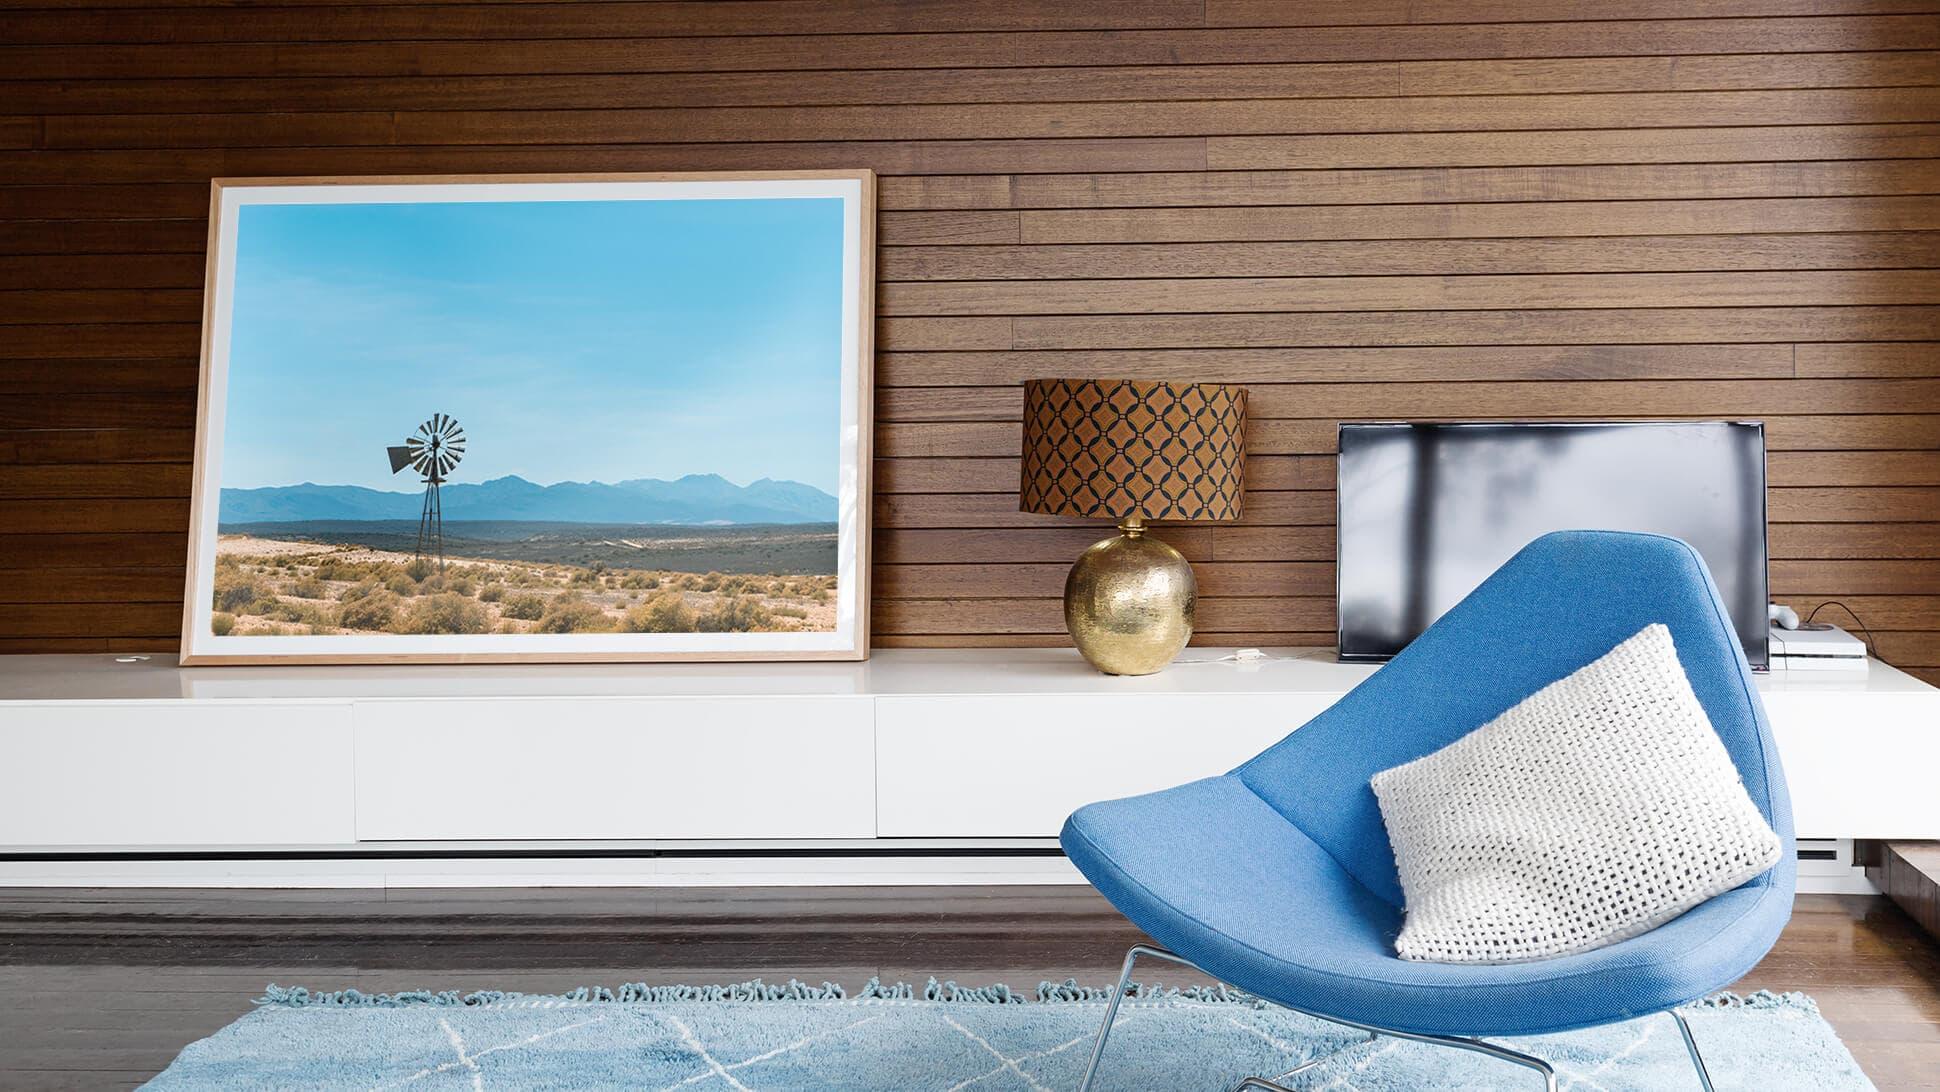 Stampa poster fotografici per quadri | tictac.it